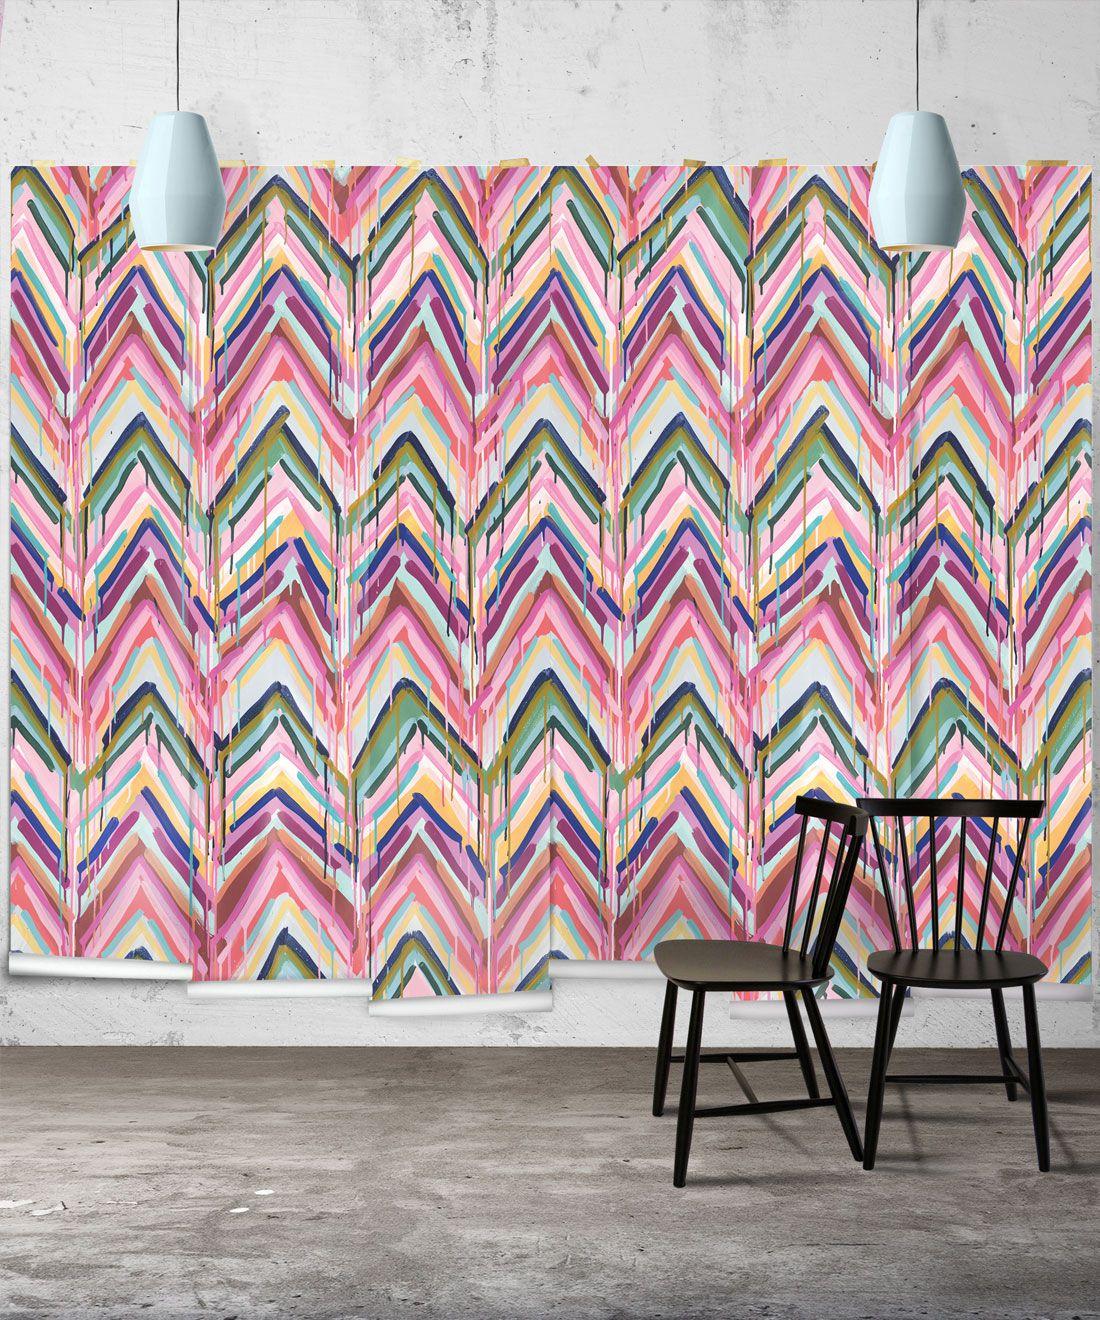 Crossroads Wallpaper •Colourful Painterly Wallpaper • Tiff Manuell • Chevron Wallpaper • Wide Insitu